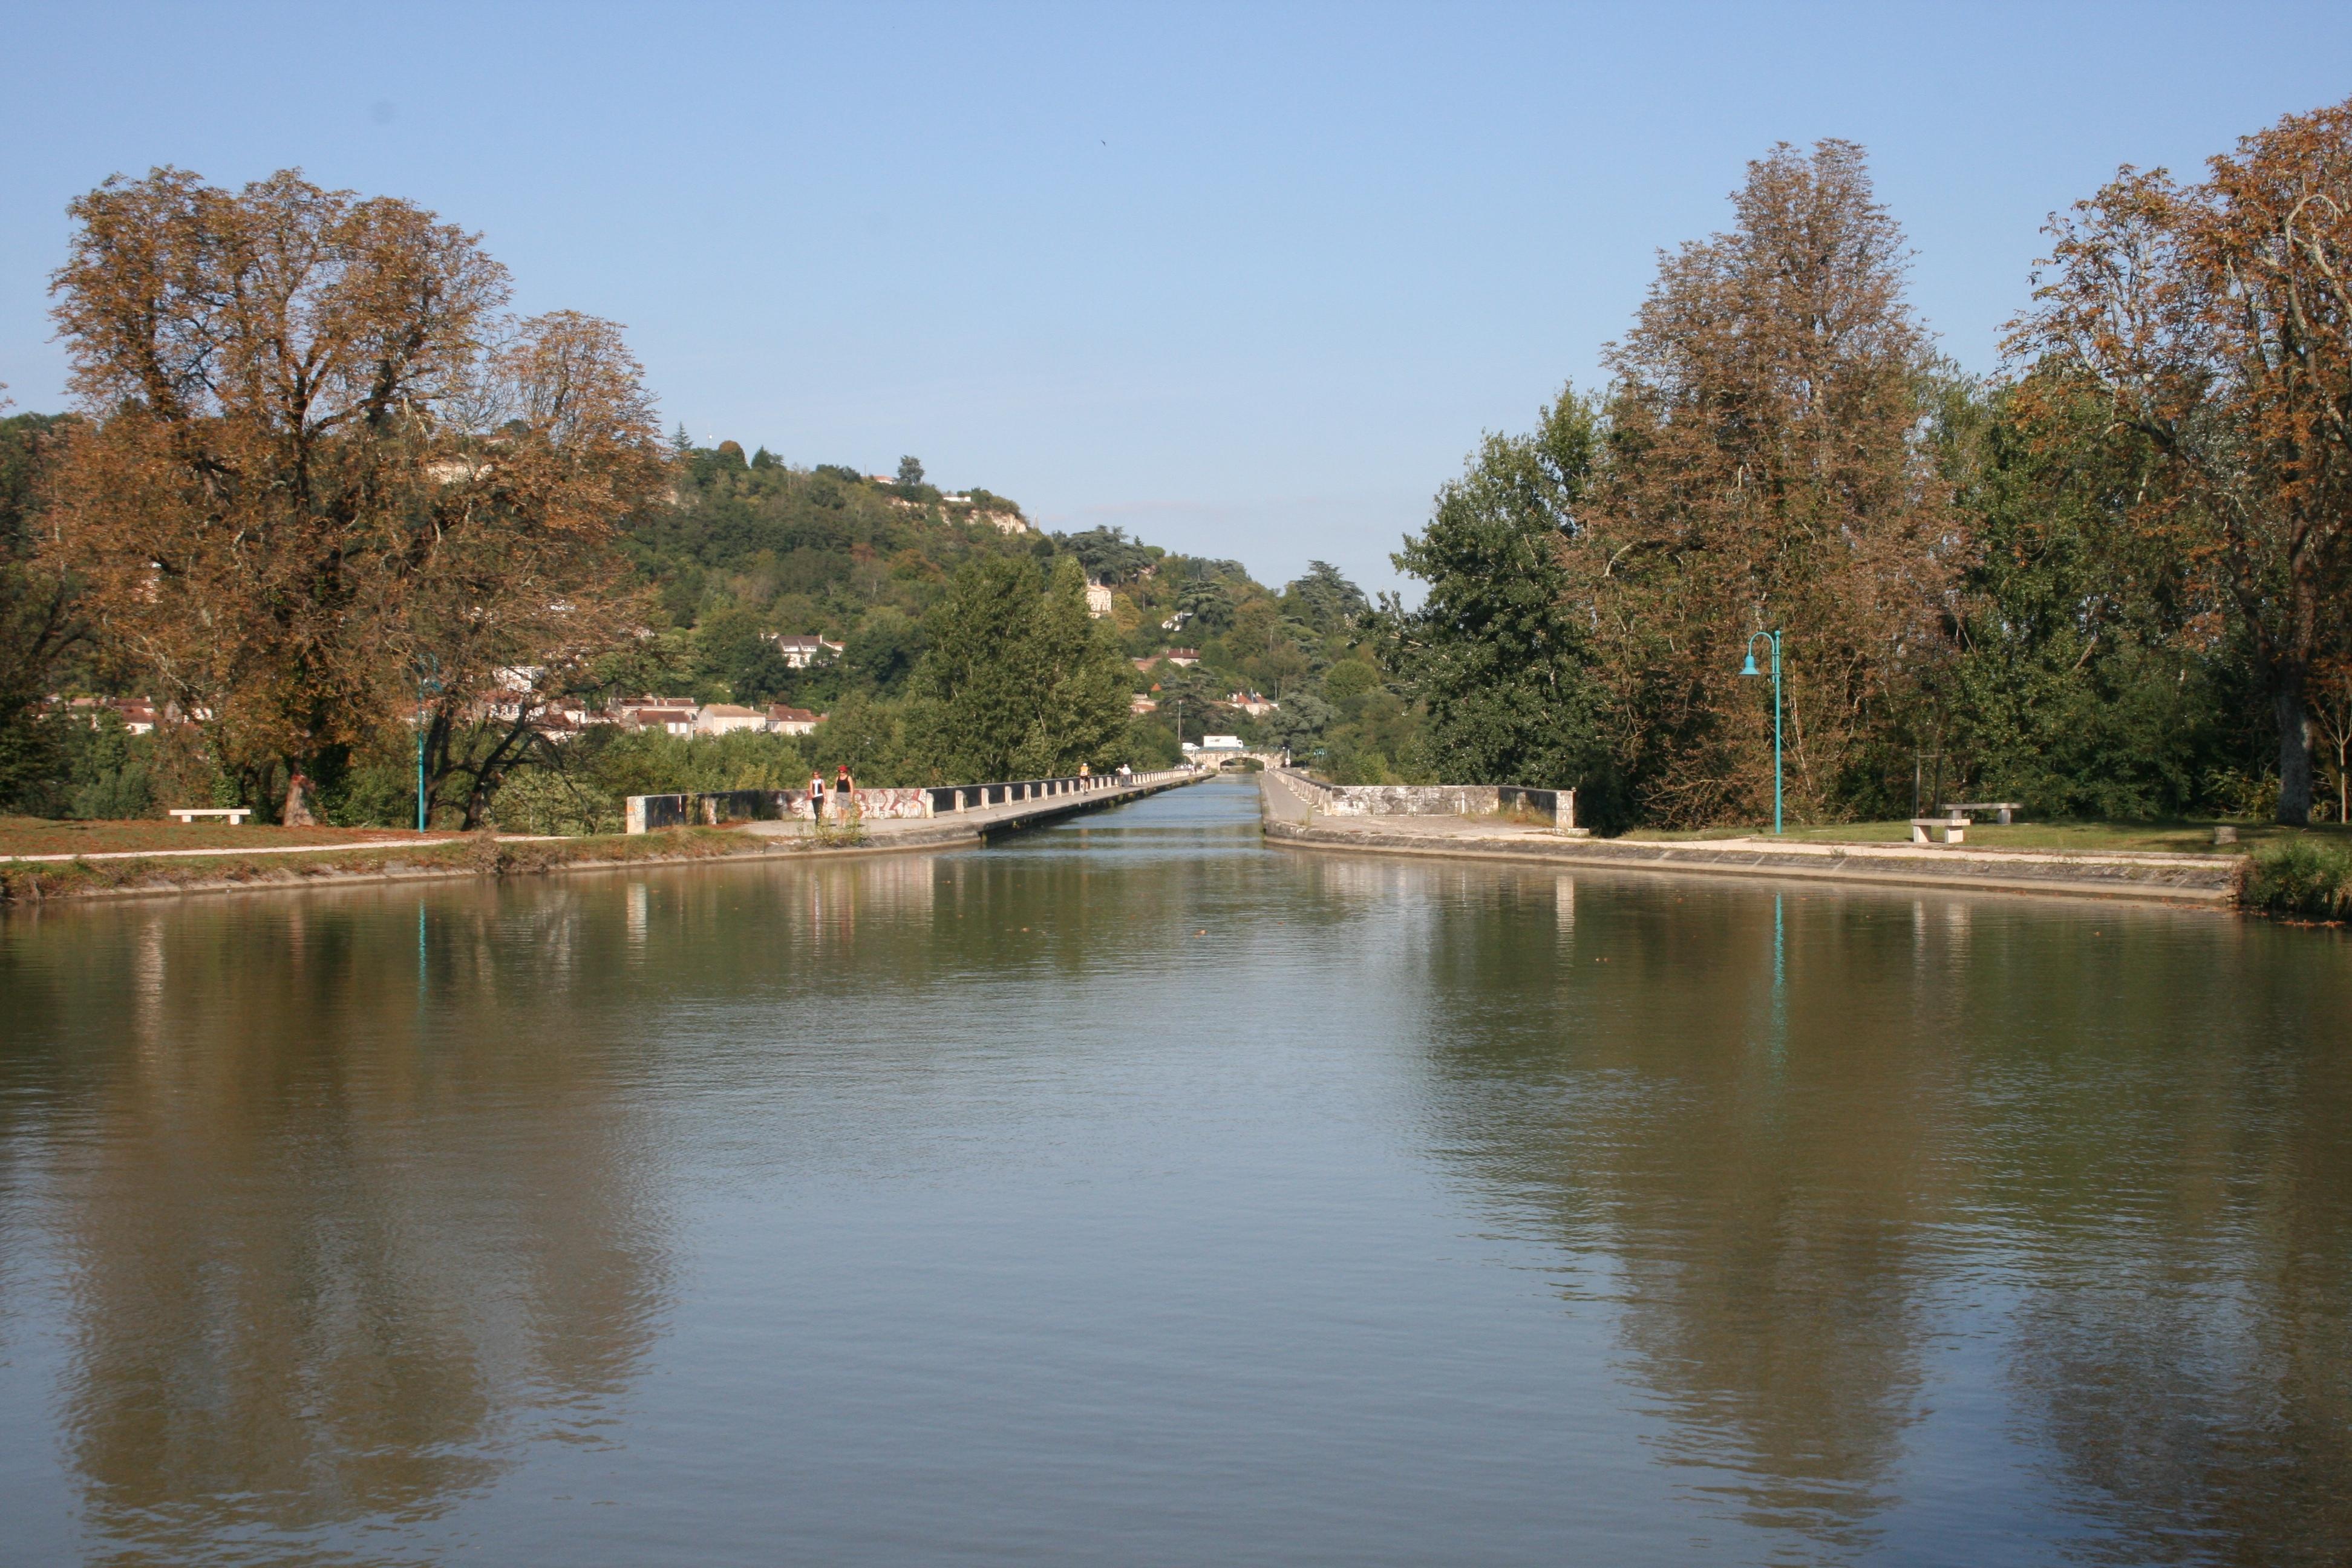 File:Pont Canal d'Agen 5.jpg